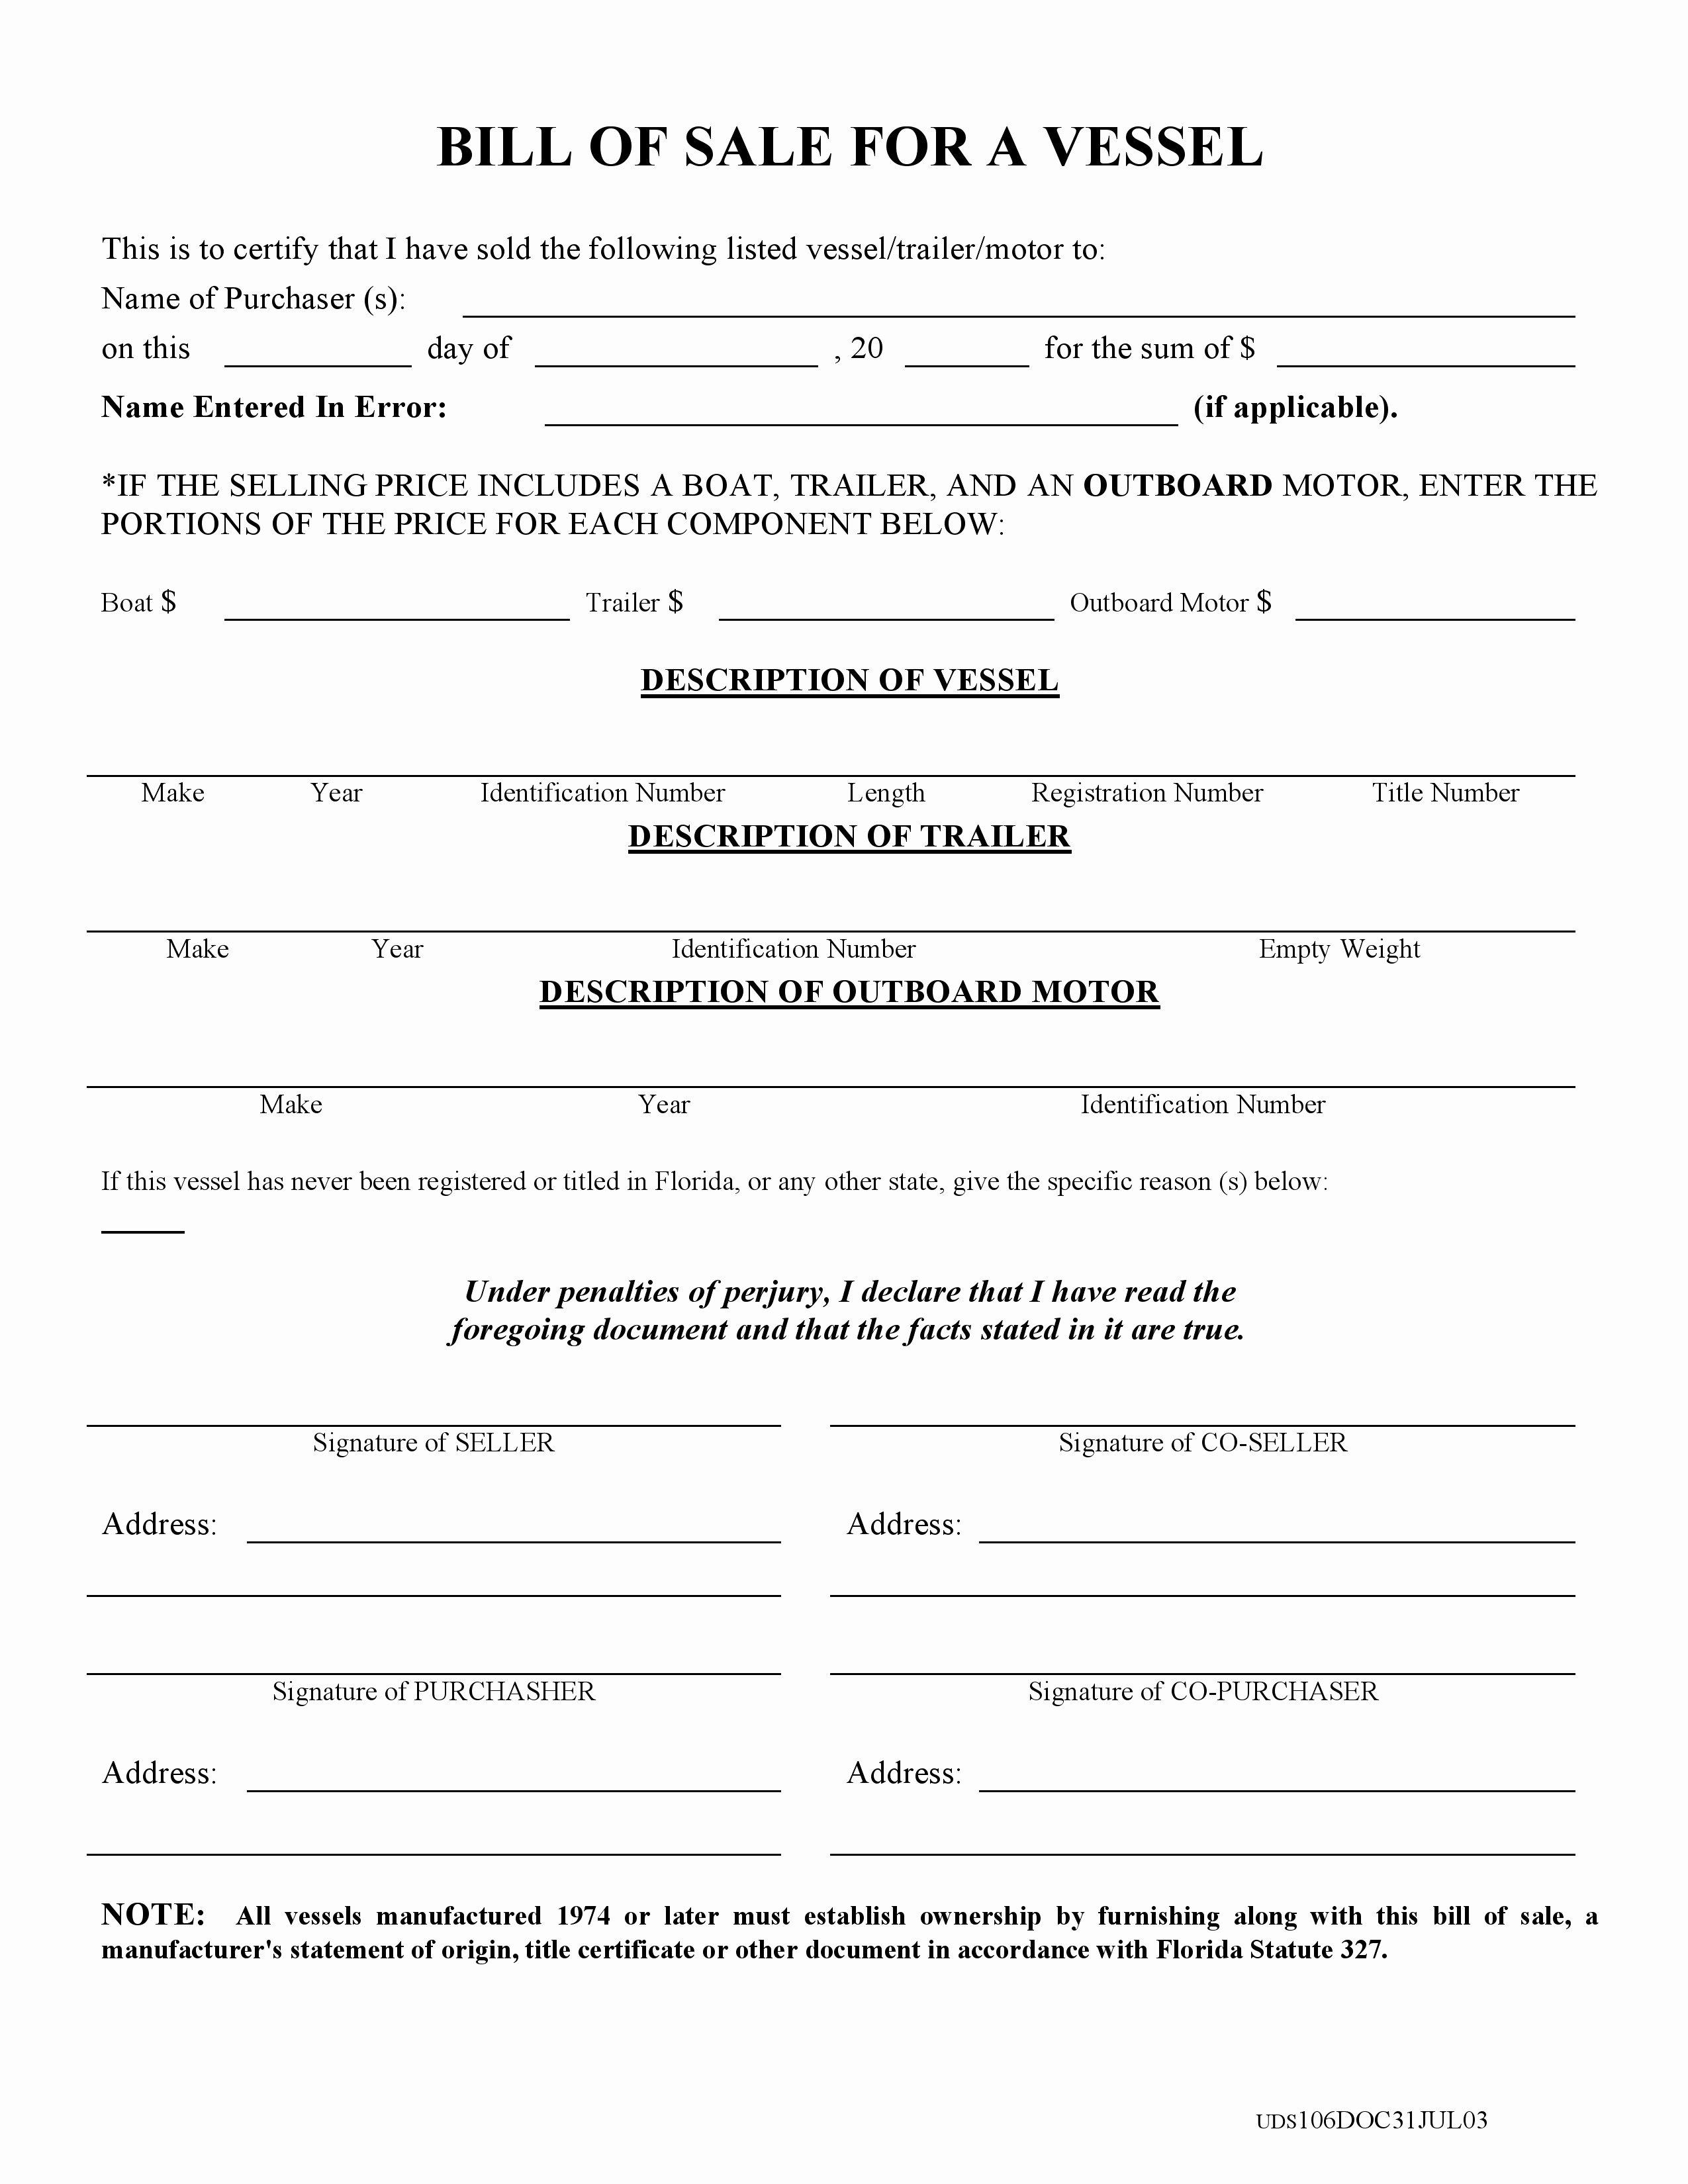 Firearm Bill Of Sale Florida Luxury Free Florida Boat Bill Of Sale form Pdf